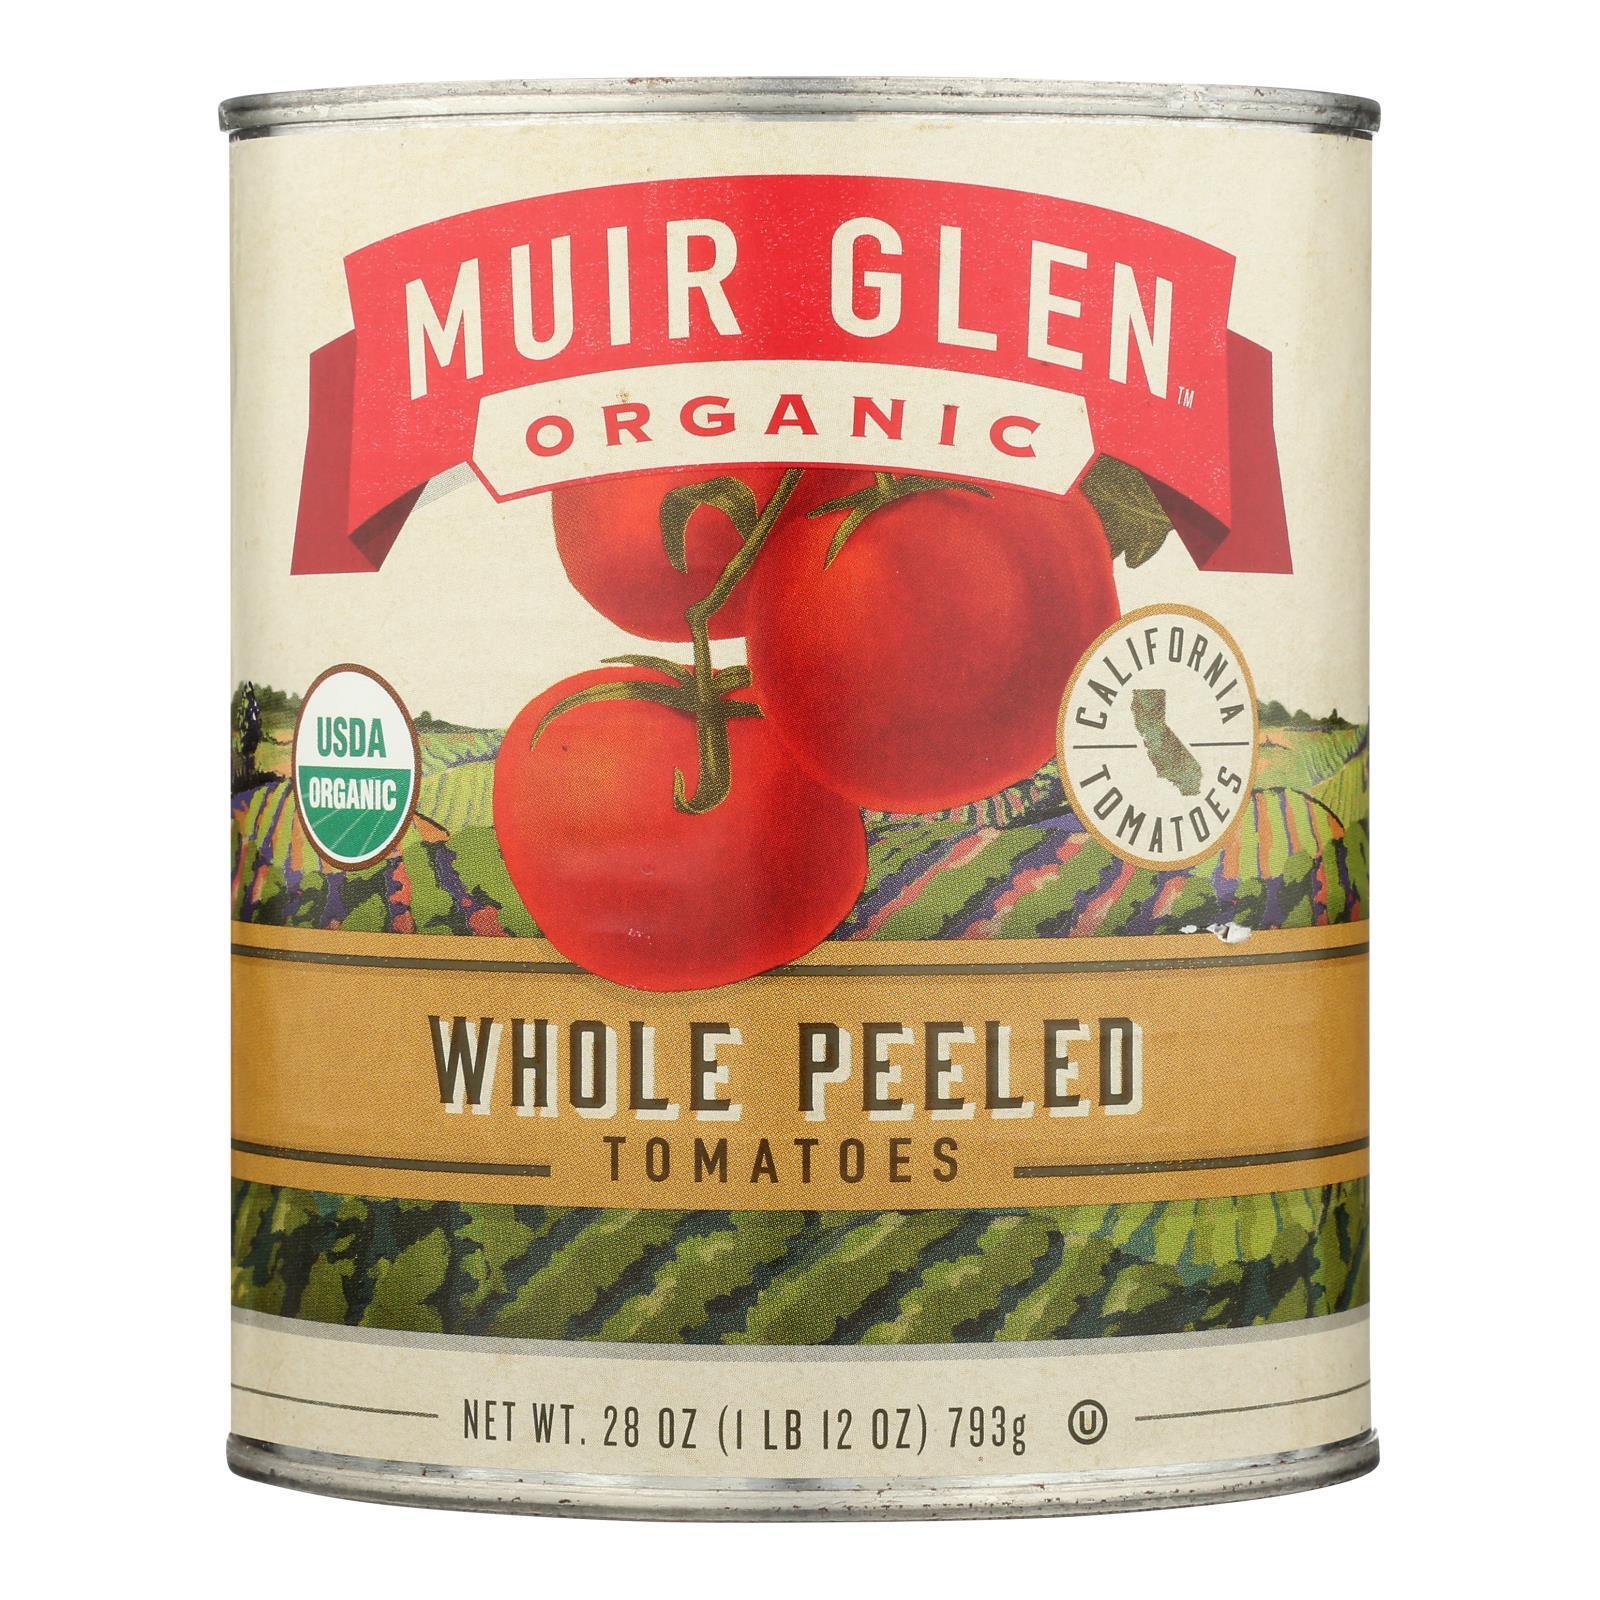 Muir Glen Organic Whole Peeled Tomatoes - Case of 12 - 28 oz.